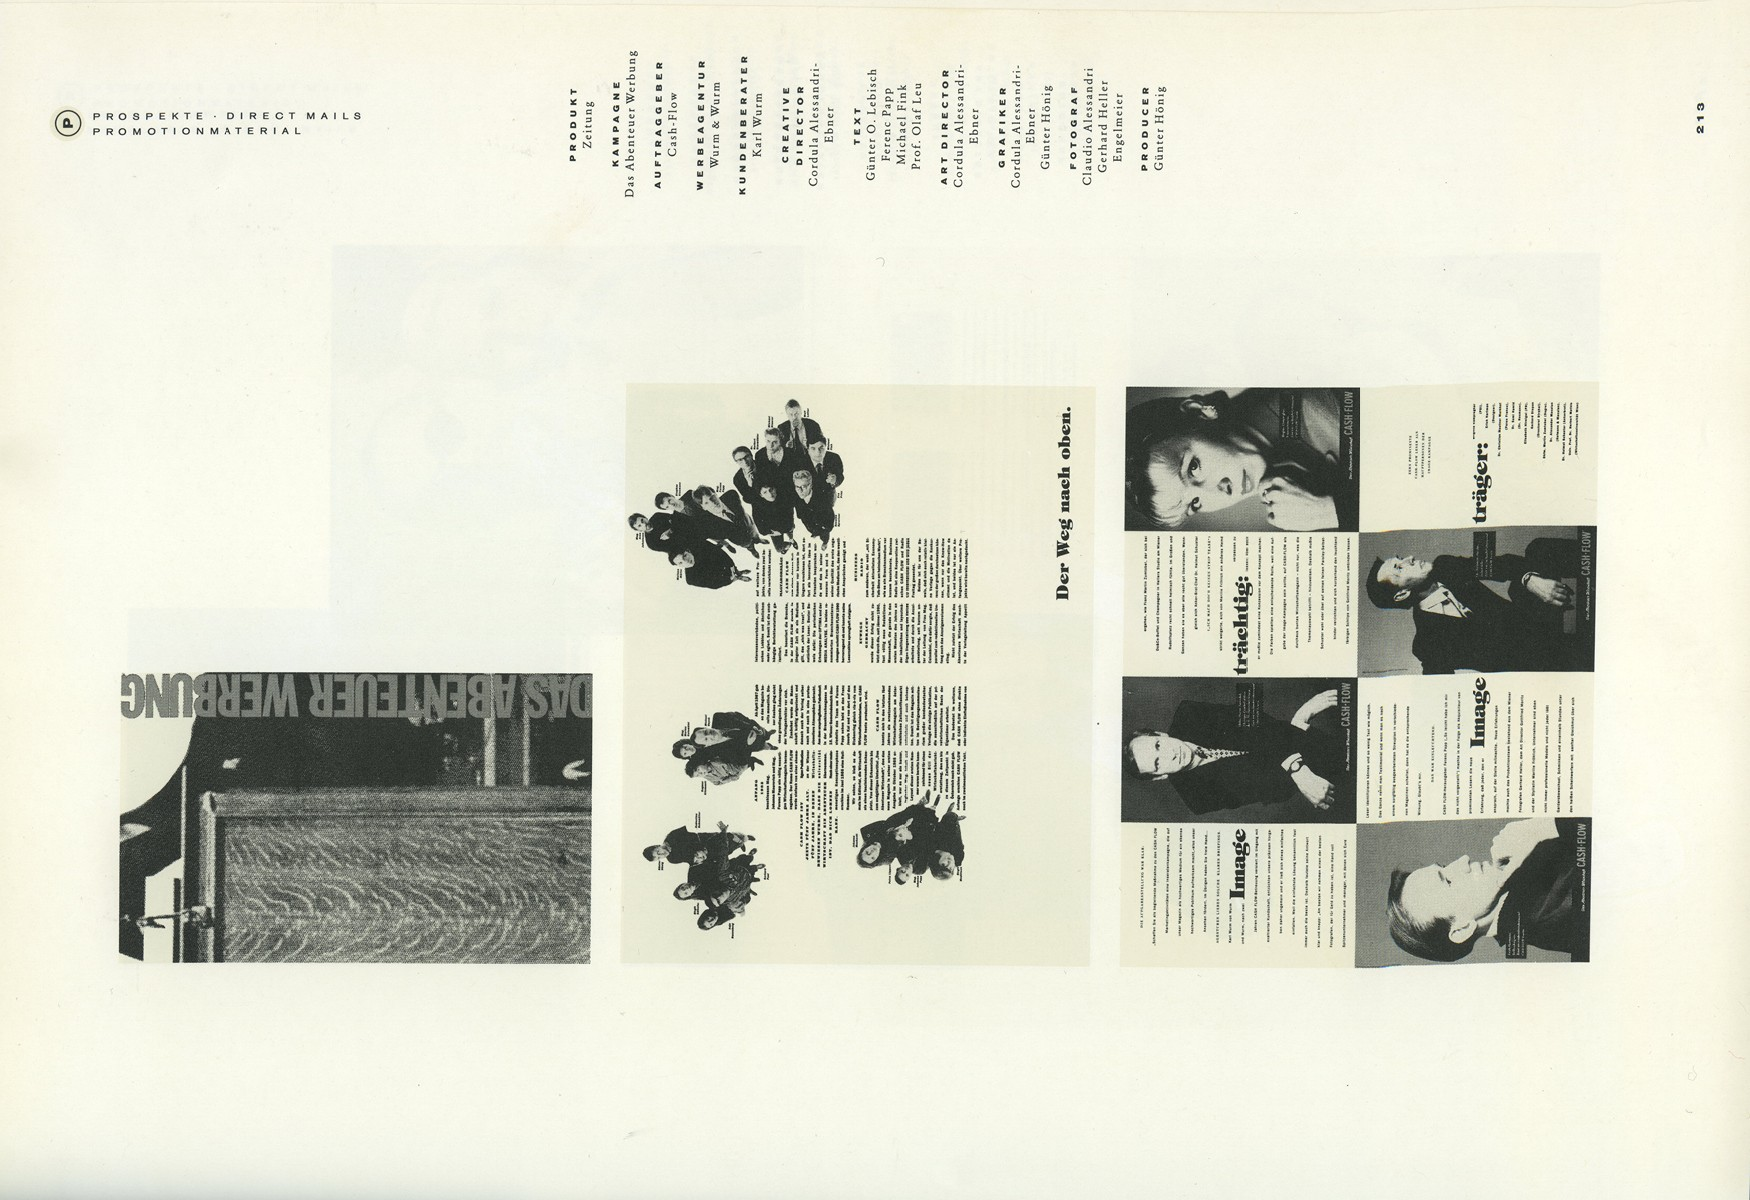 1991_CCA-AZ_CashFlowDasAbenteuerWerbung_Editorial